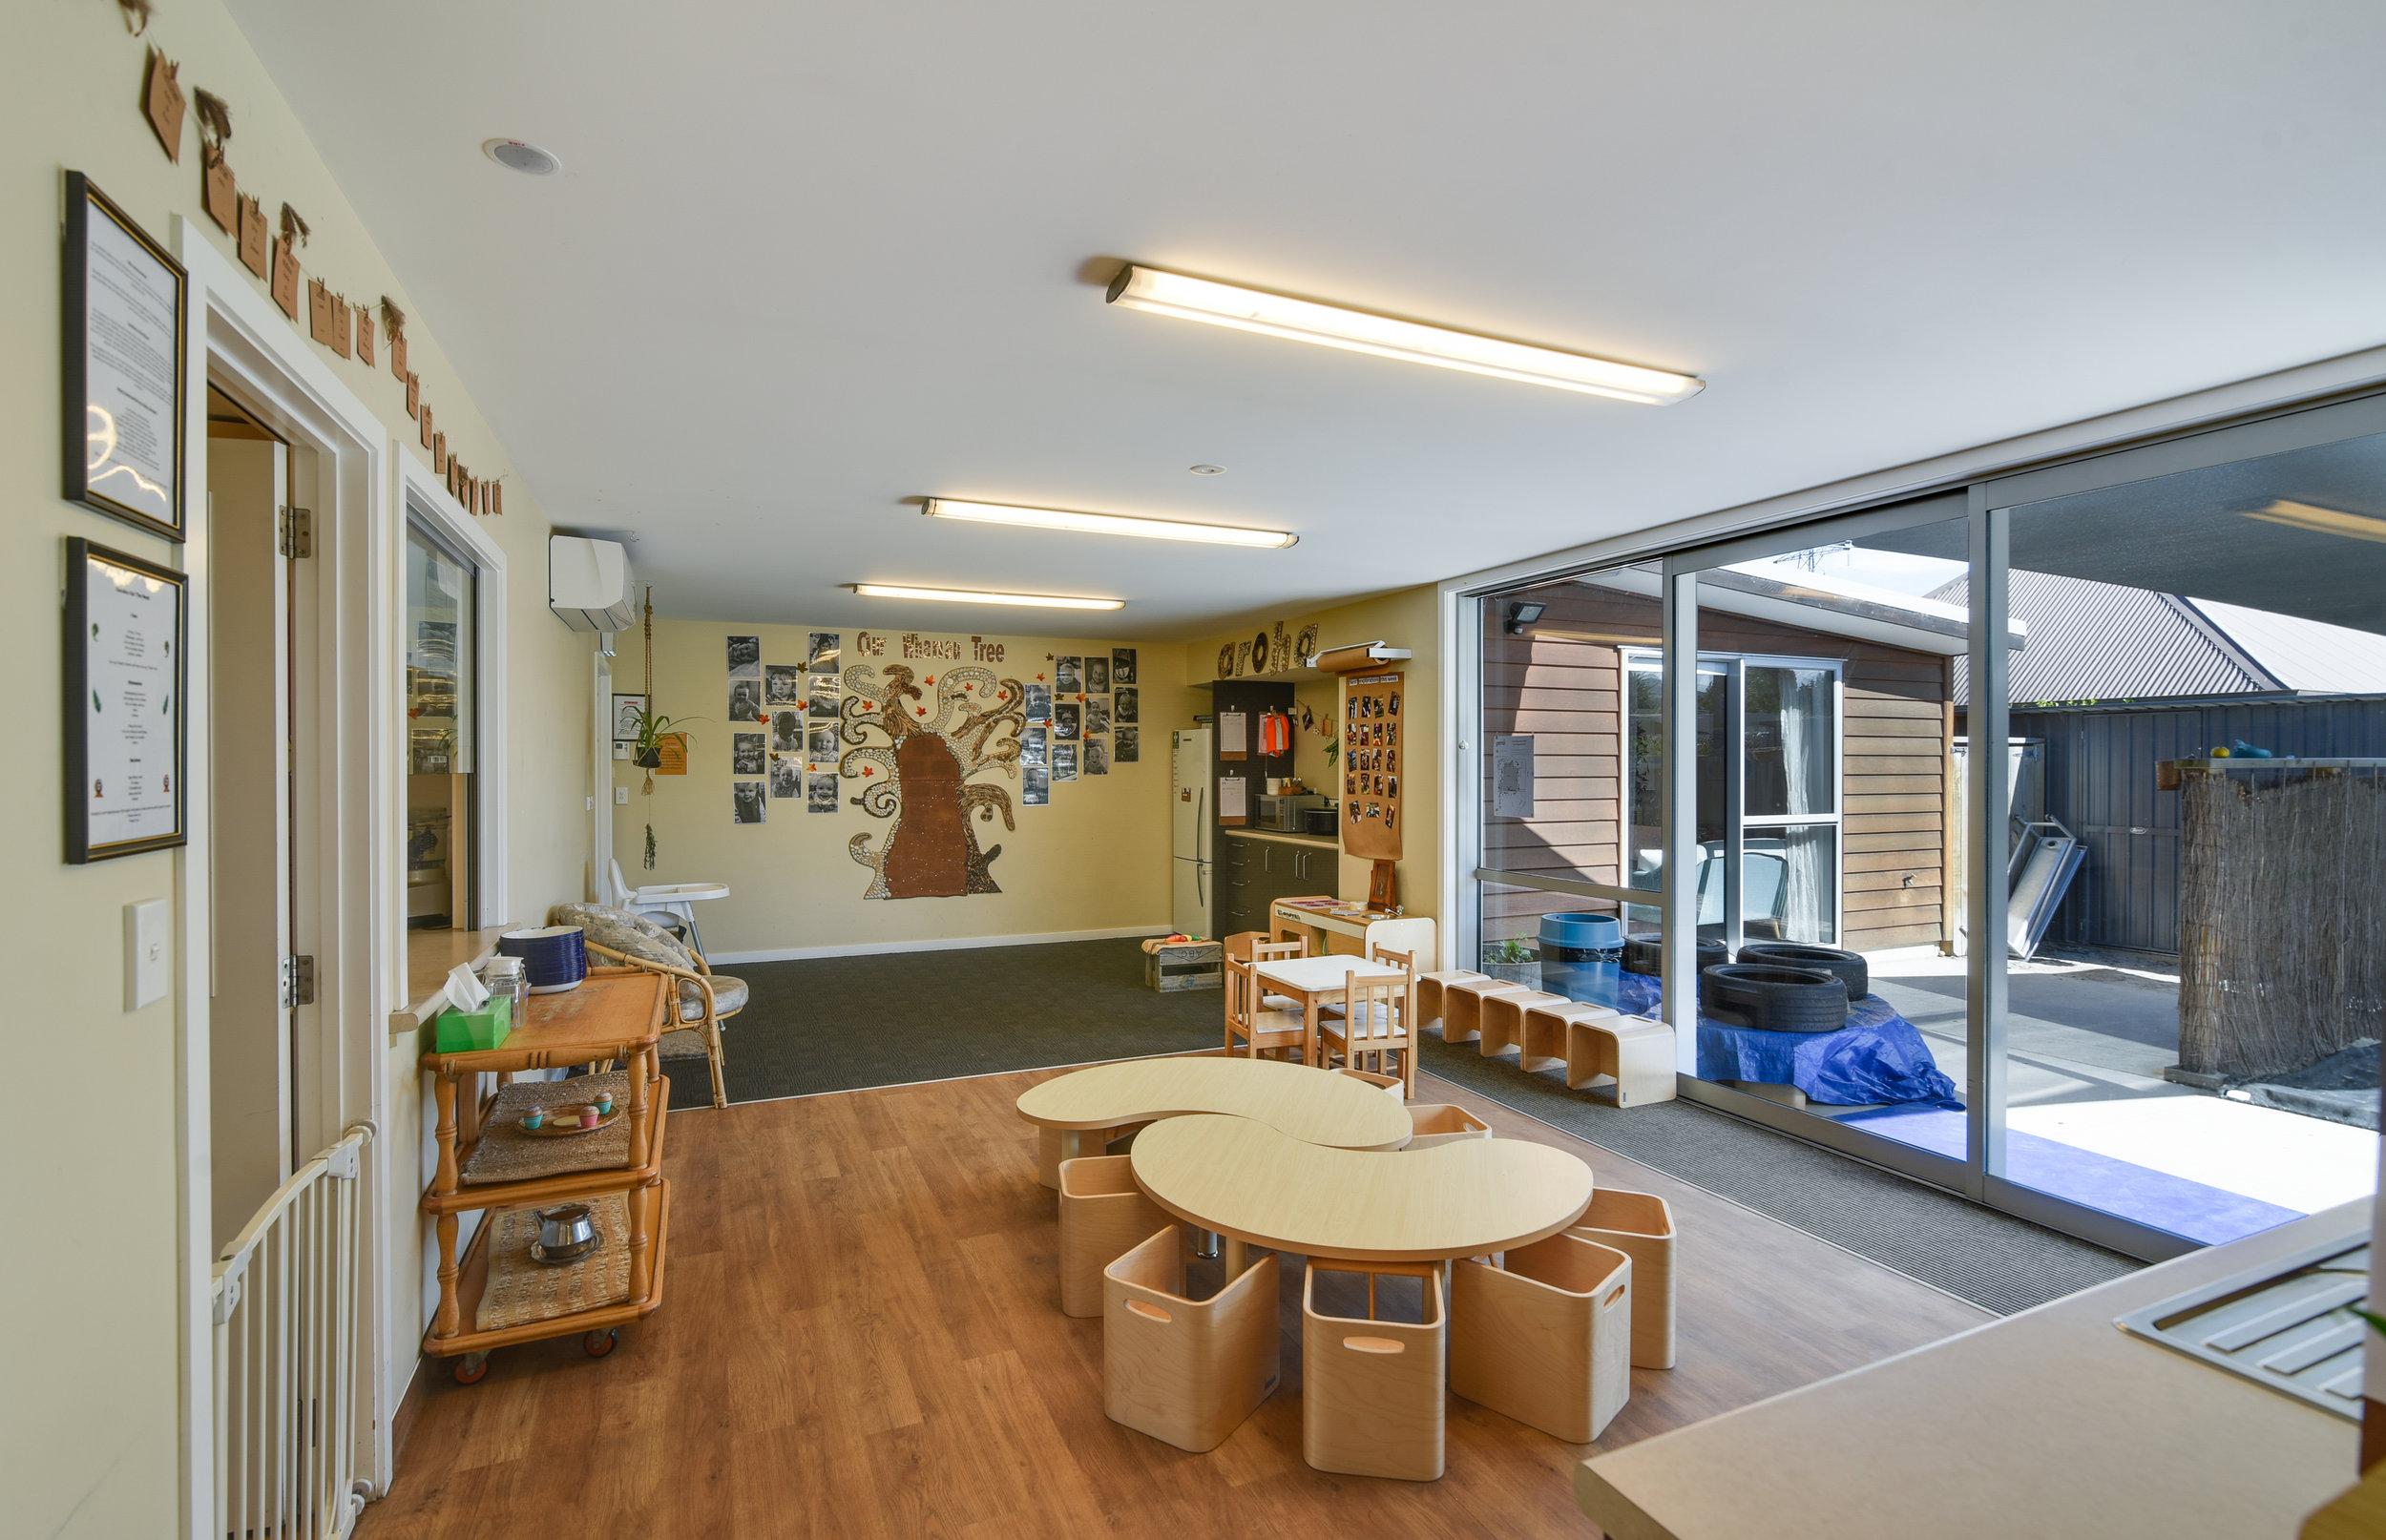 Gems Childcare interiors-10.jpg